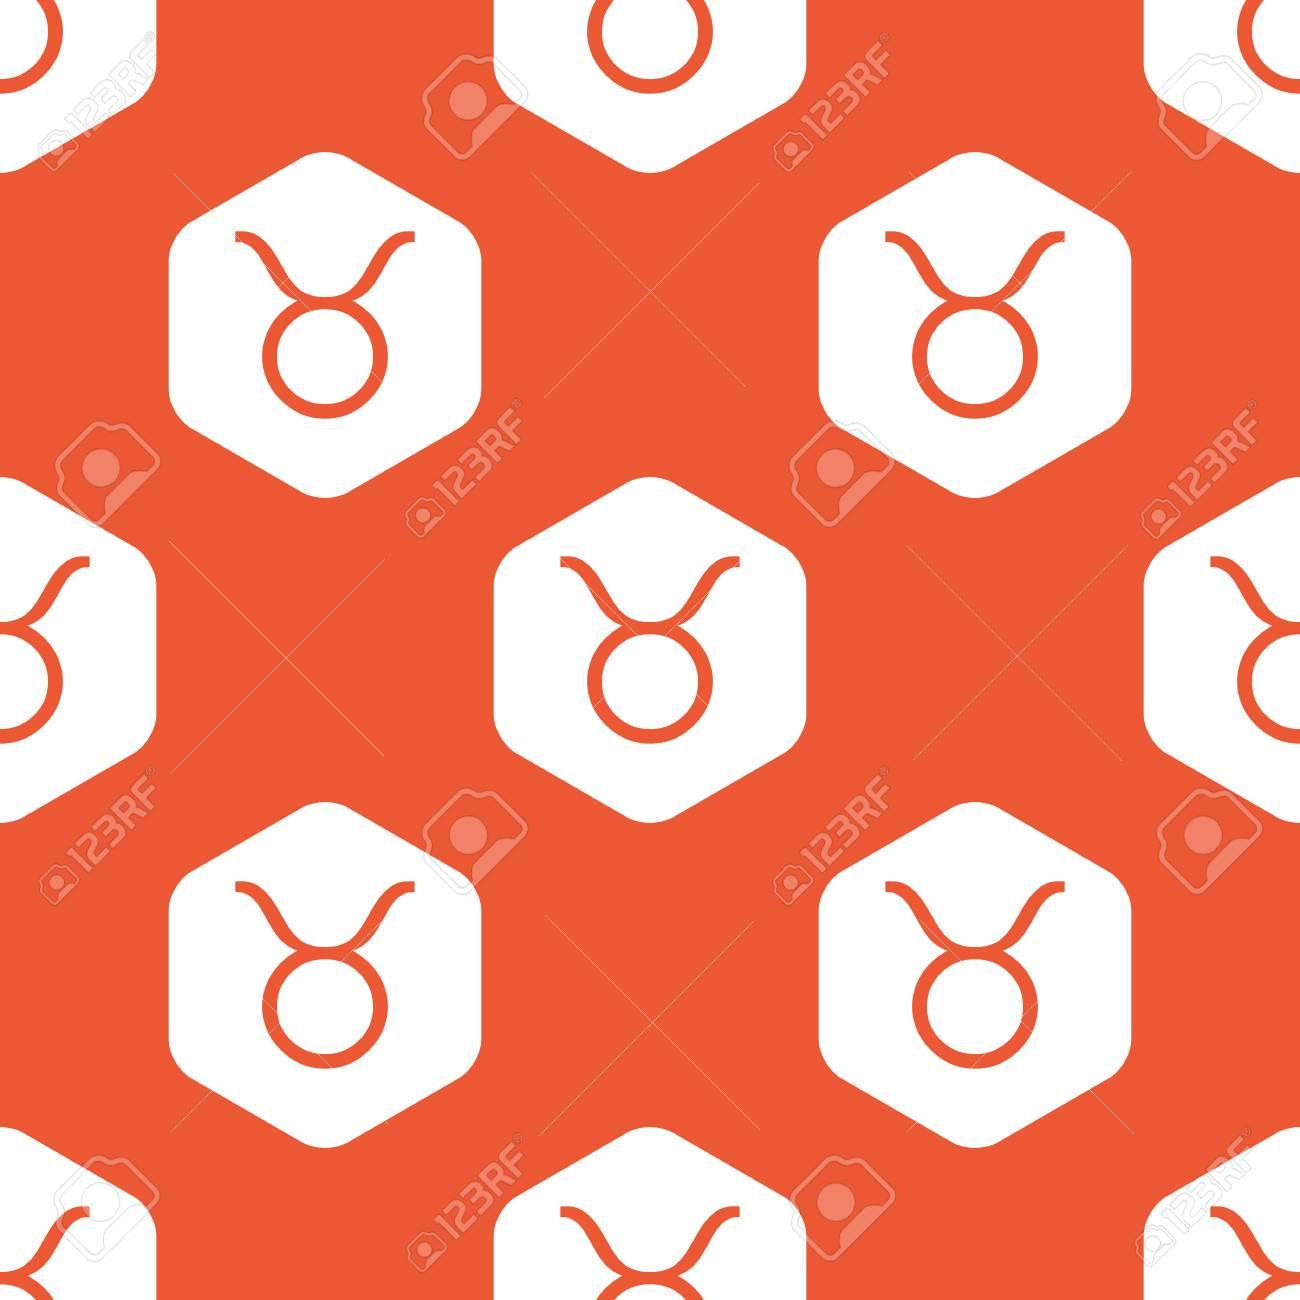 Image Of Taurus Zodiac Symbol In White Hexagon Repeated On Orange